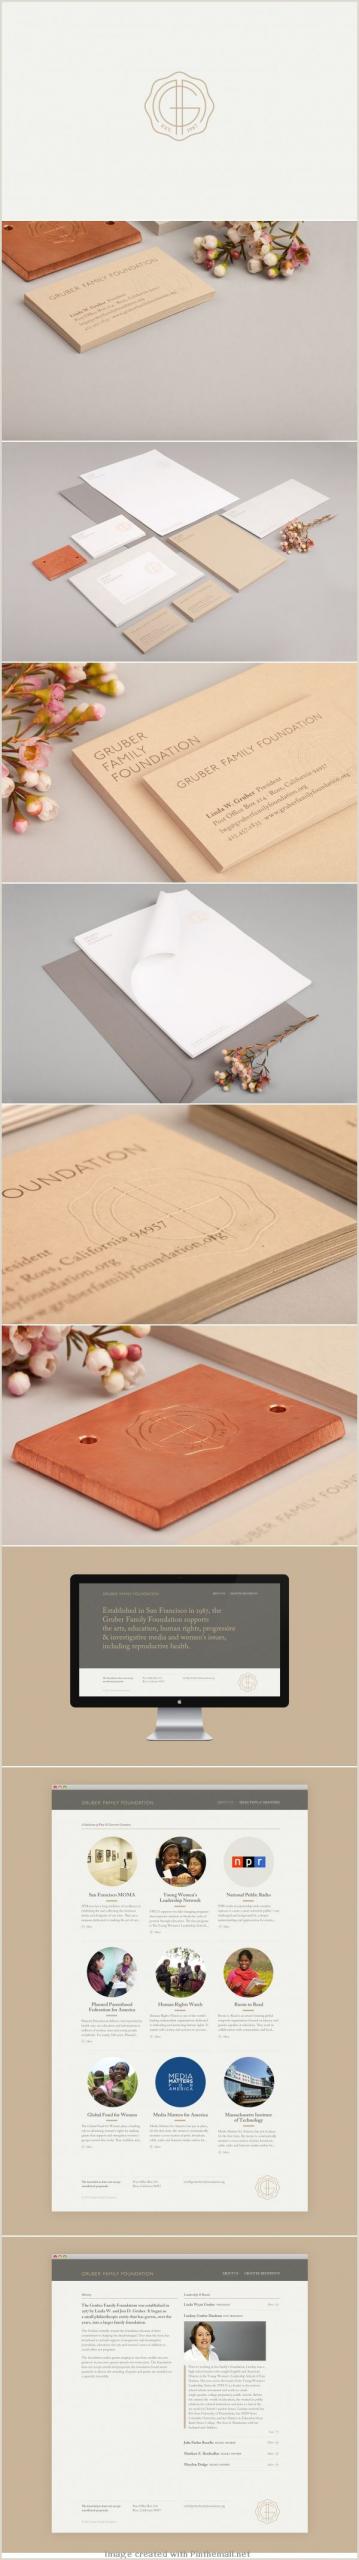 New Business Card Design 14 Popular Hardwood Flooring Business Card Template